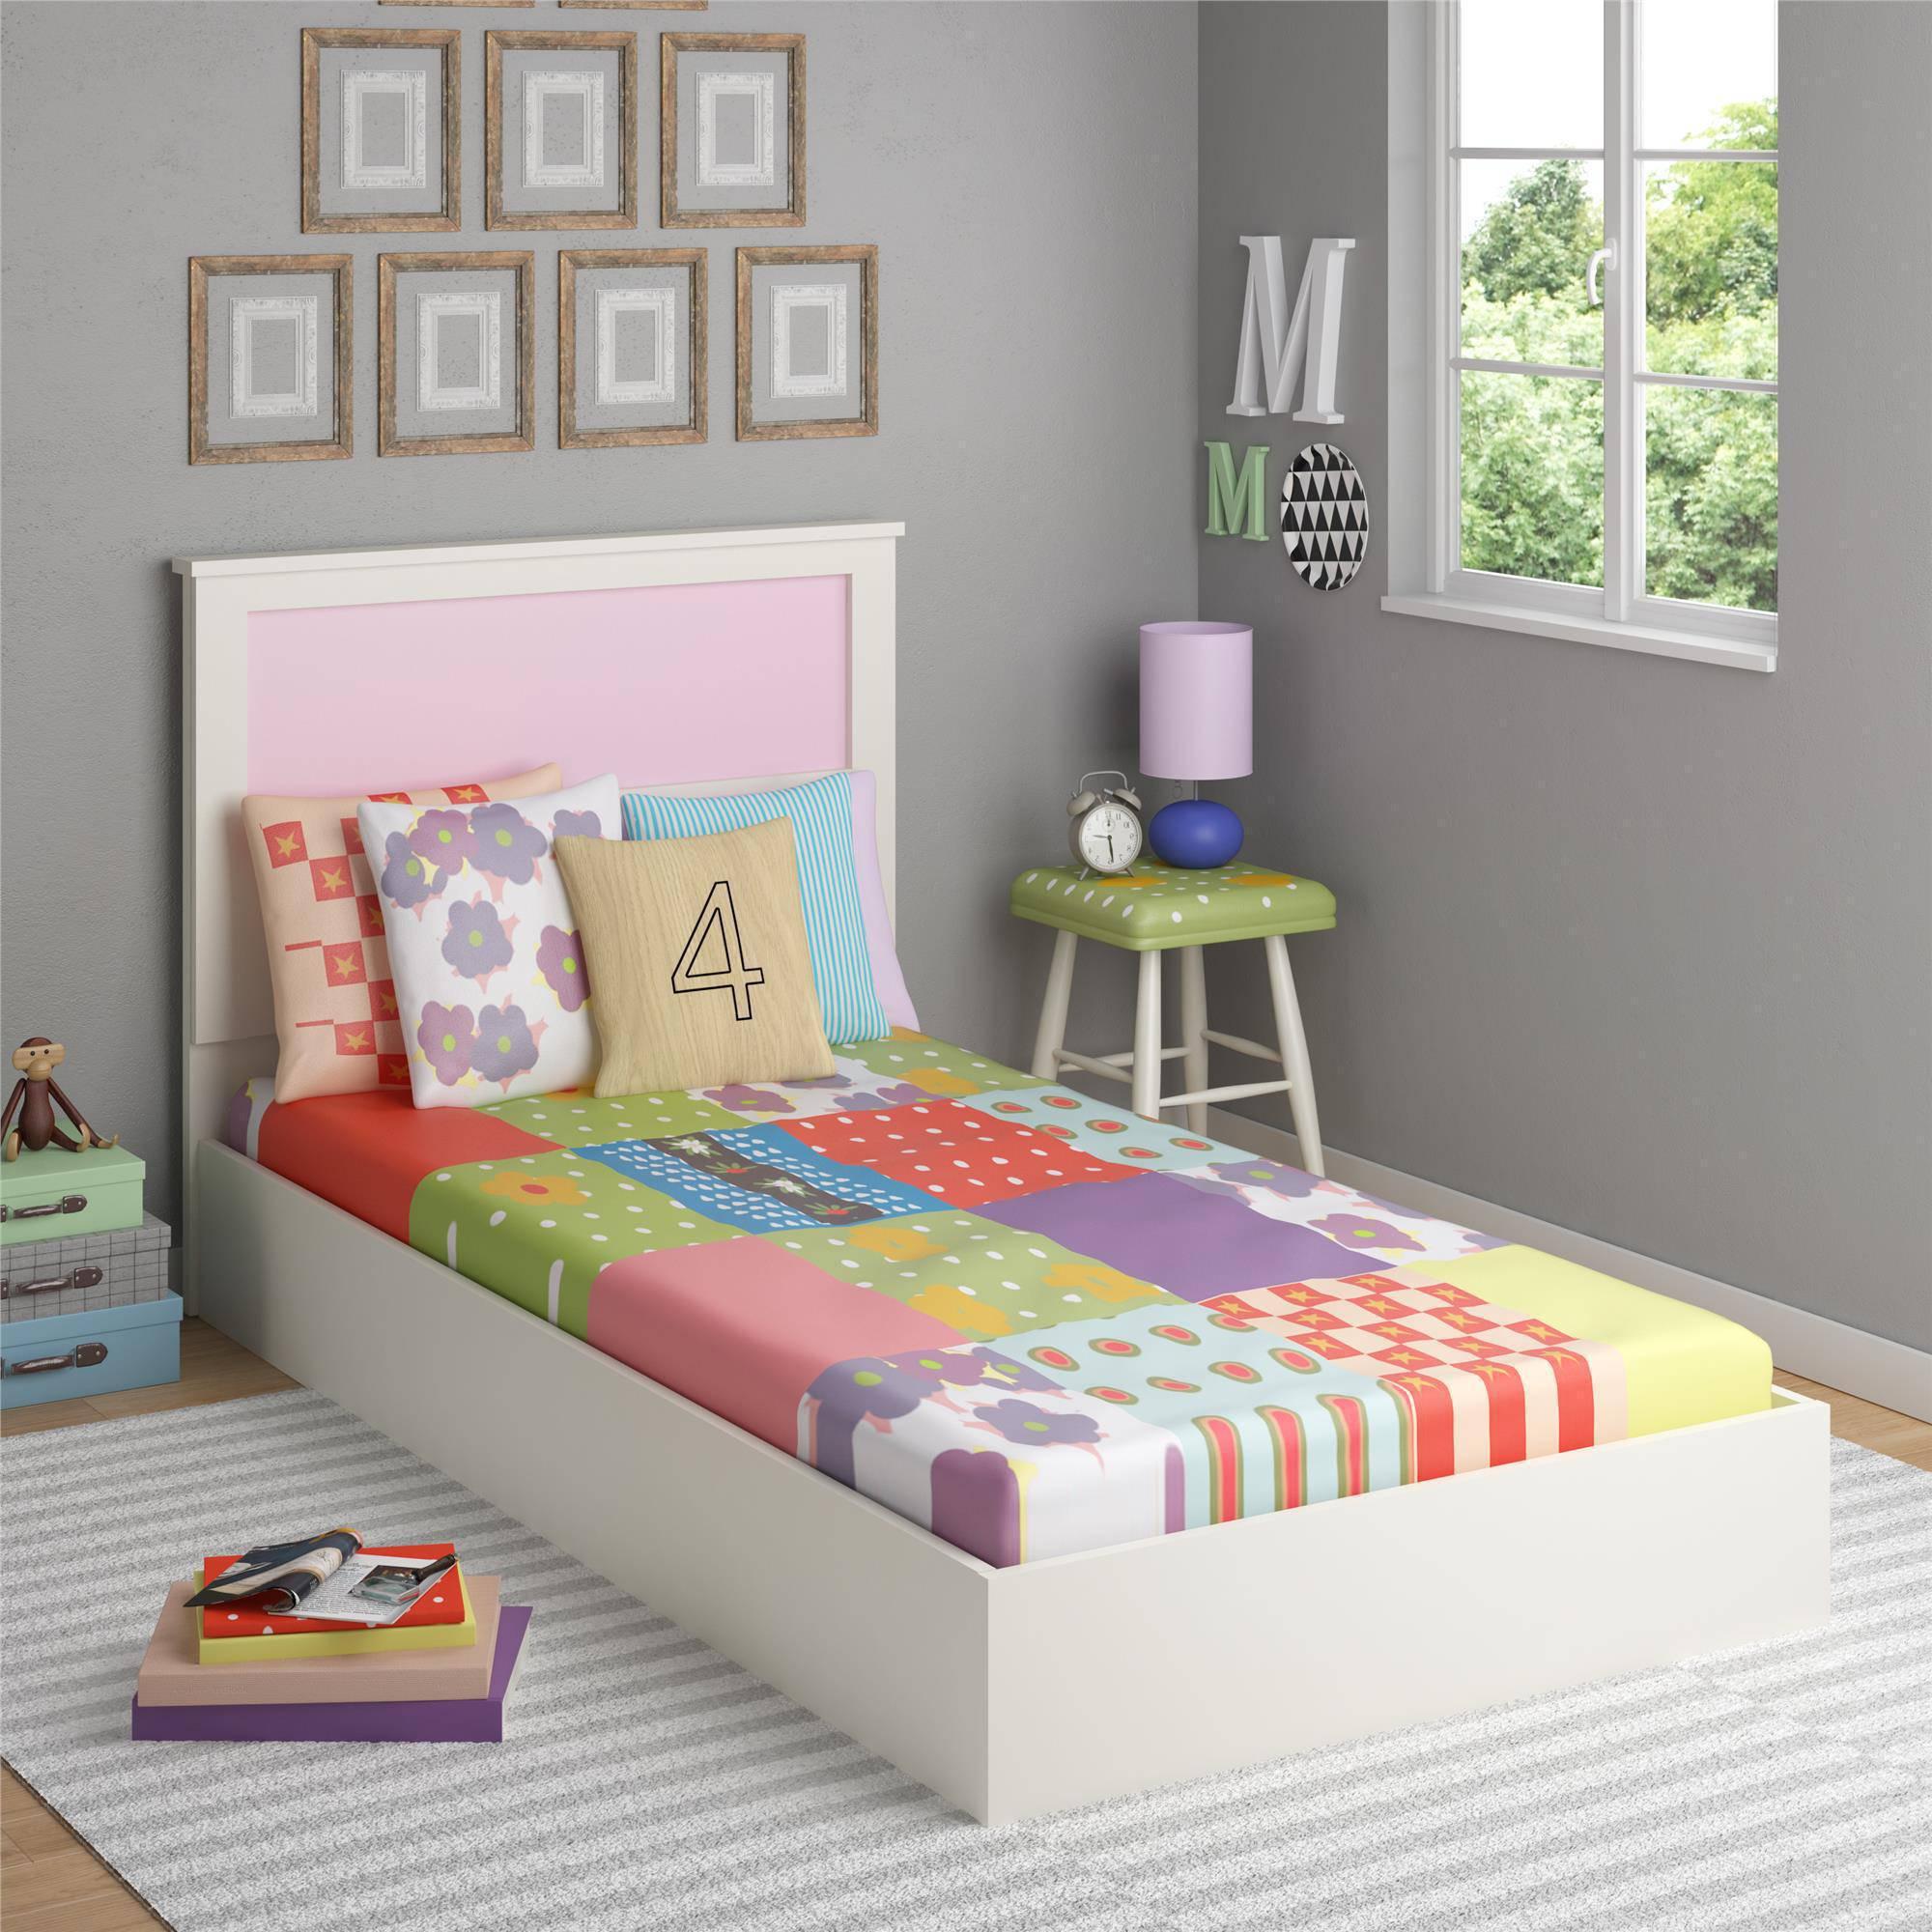 kids beds ameriwood home skyler twin bed with reversible headboard, white -  walmart.com TLIFLXC